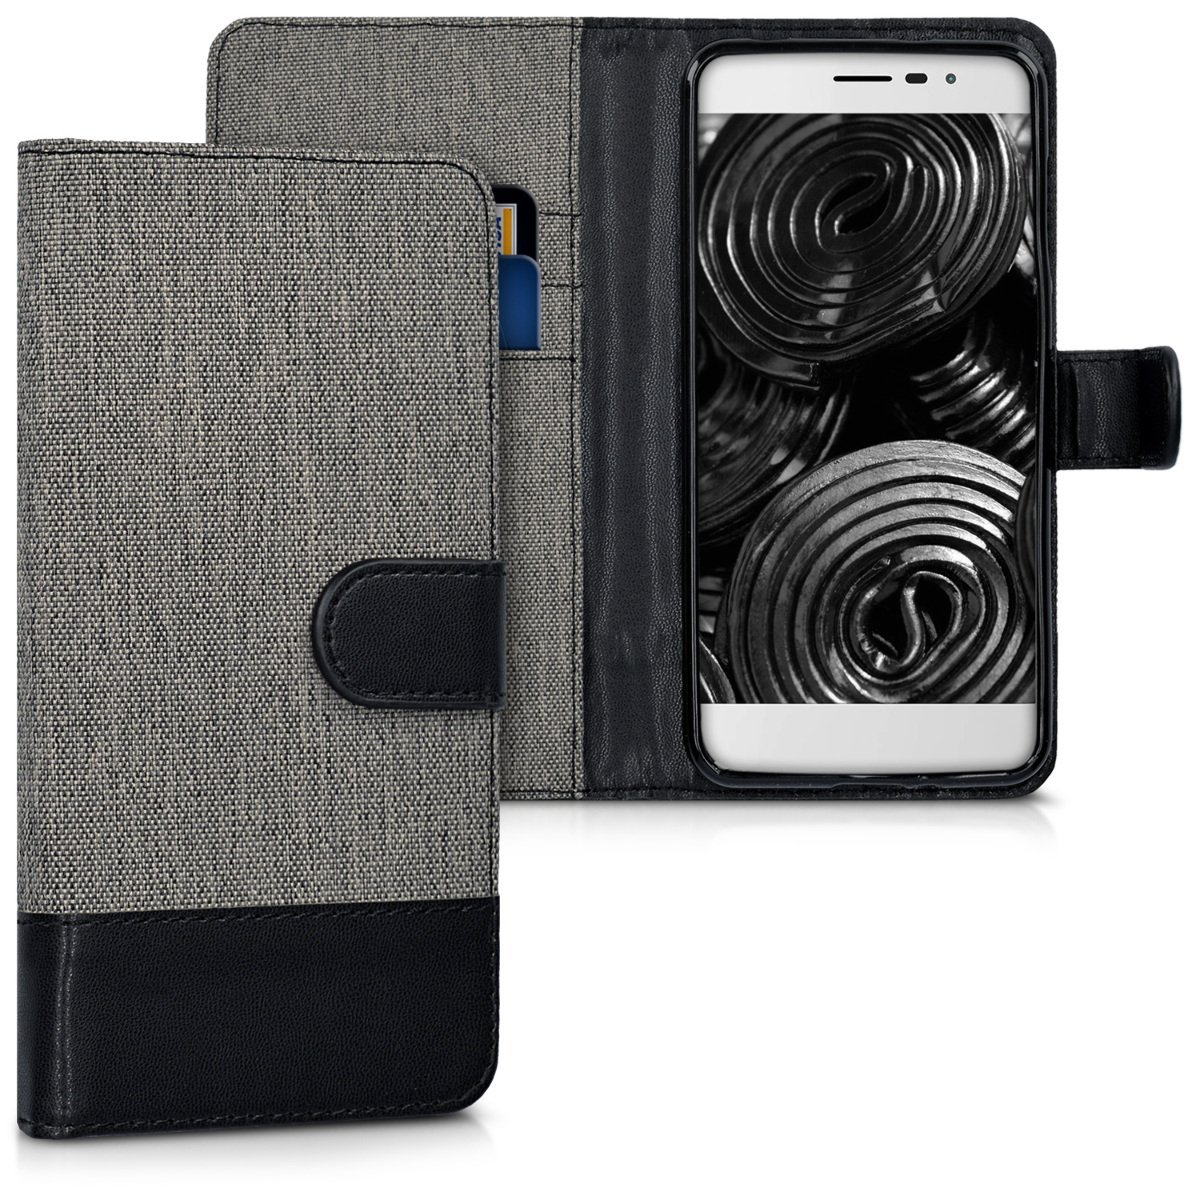 KW Θήκη - Πορτοφόλι Coolpad Torino S - Grey/ Black (40291.01)